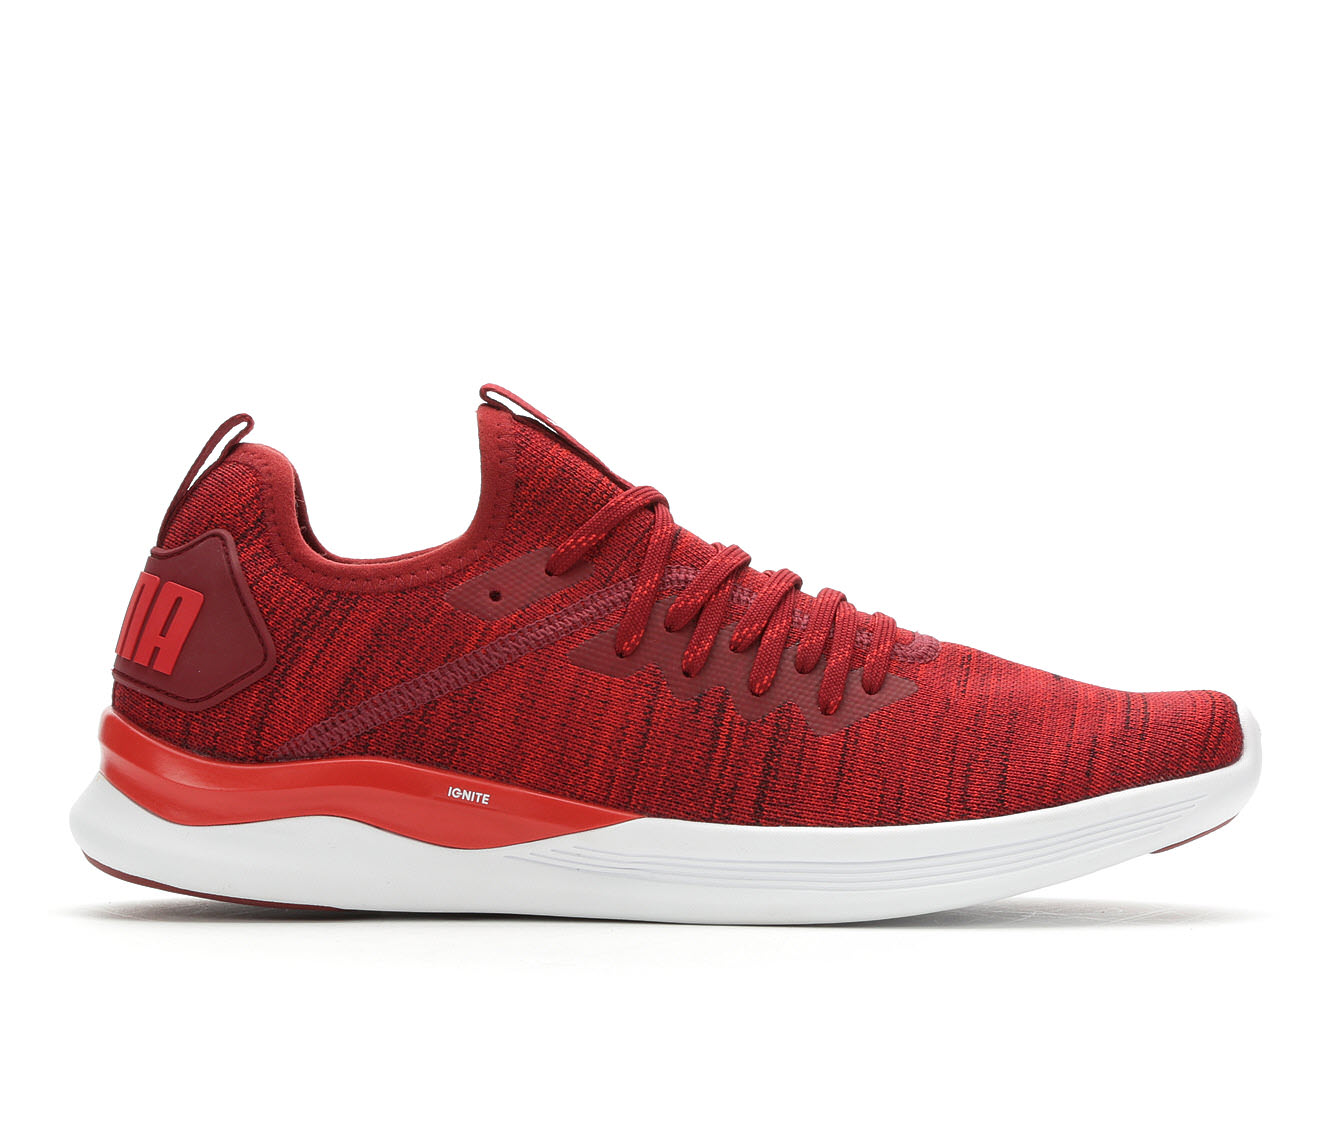 Men's Puma Ignite Flash Evoknit Sneakers (Red - Size 7) 1700601